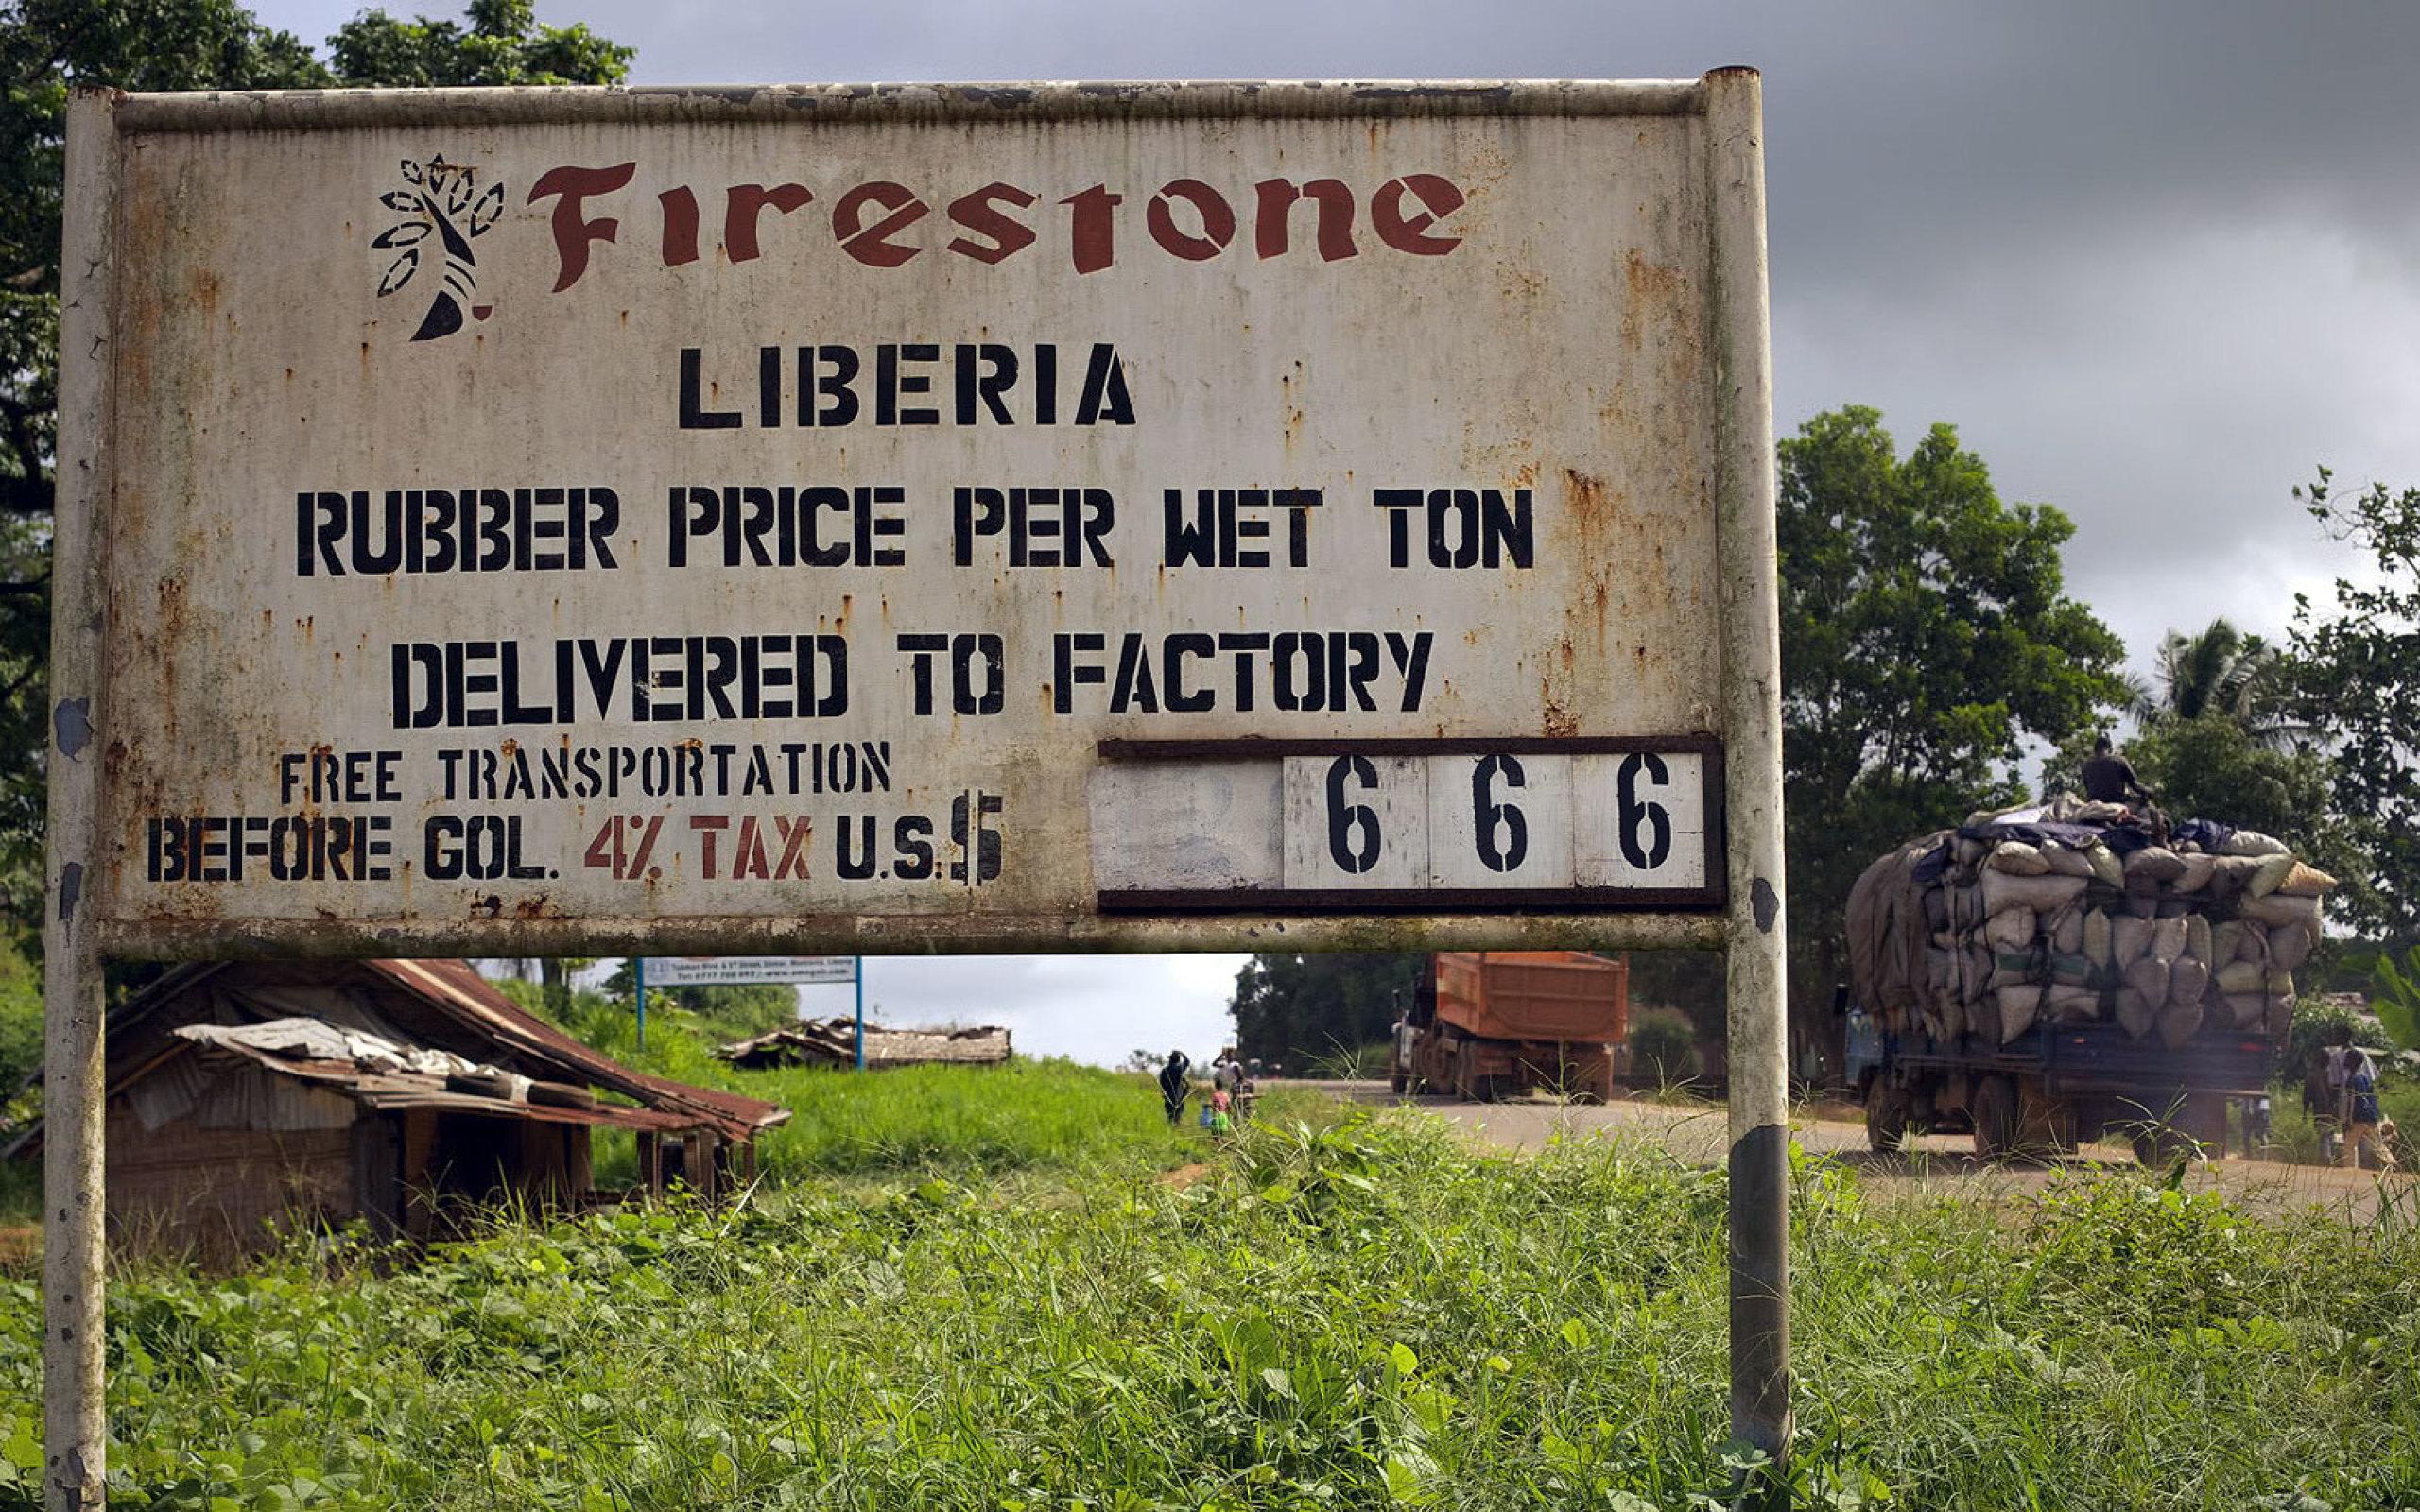 Firestone has operated a rubber plantation in Liberia since 1926.